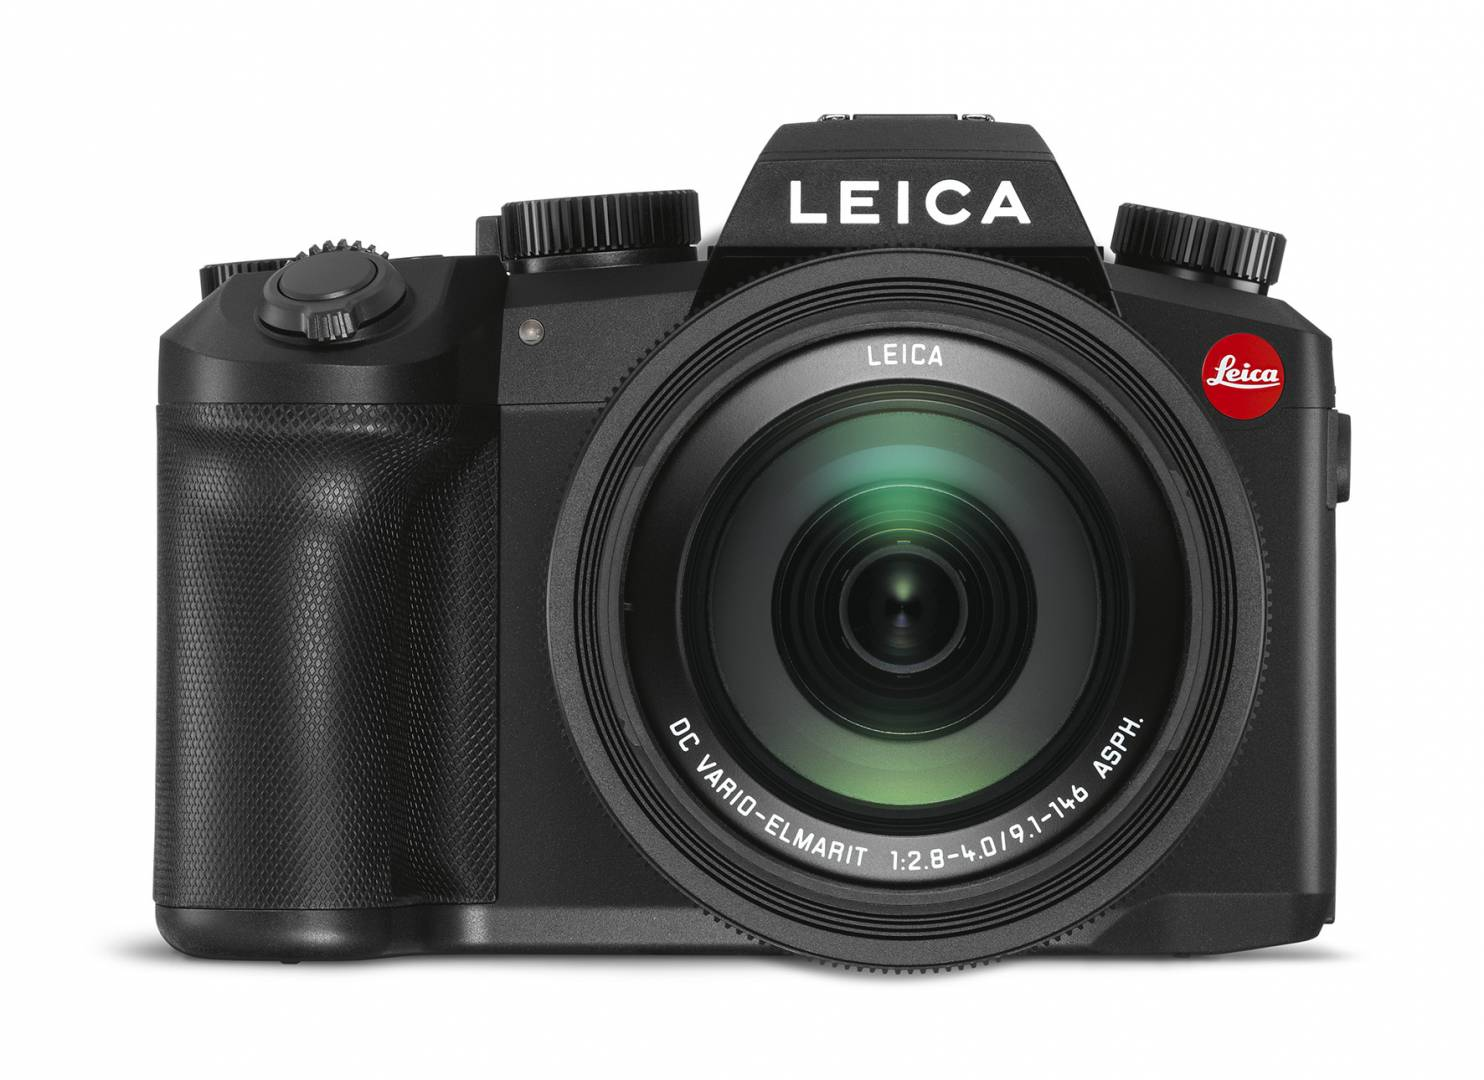 Leica announces new V-Lux 5 super zoom